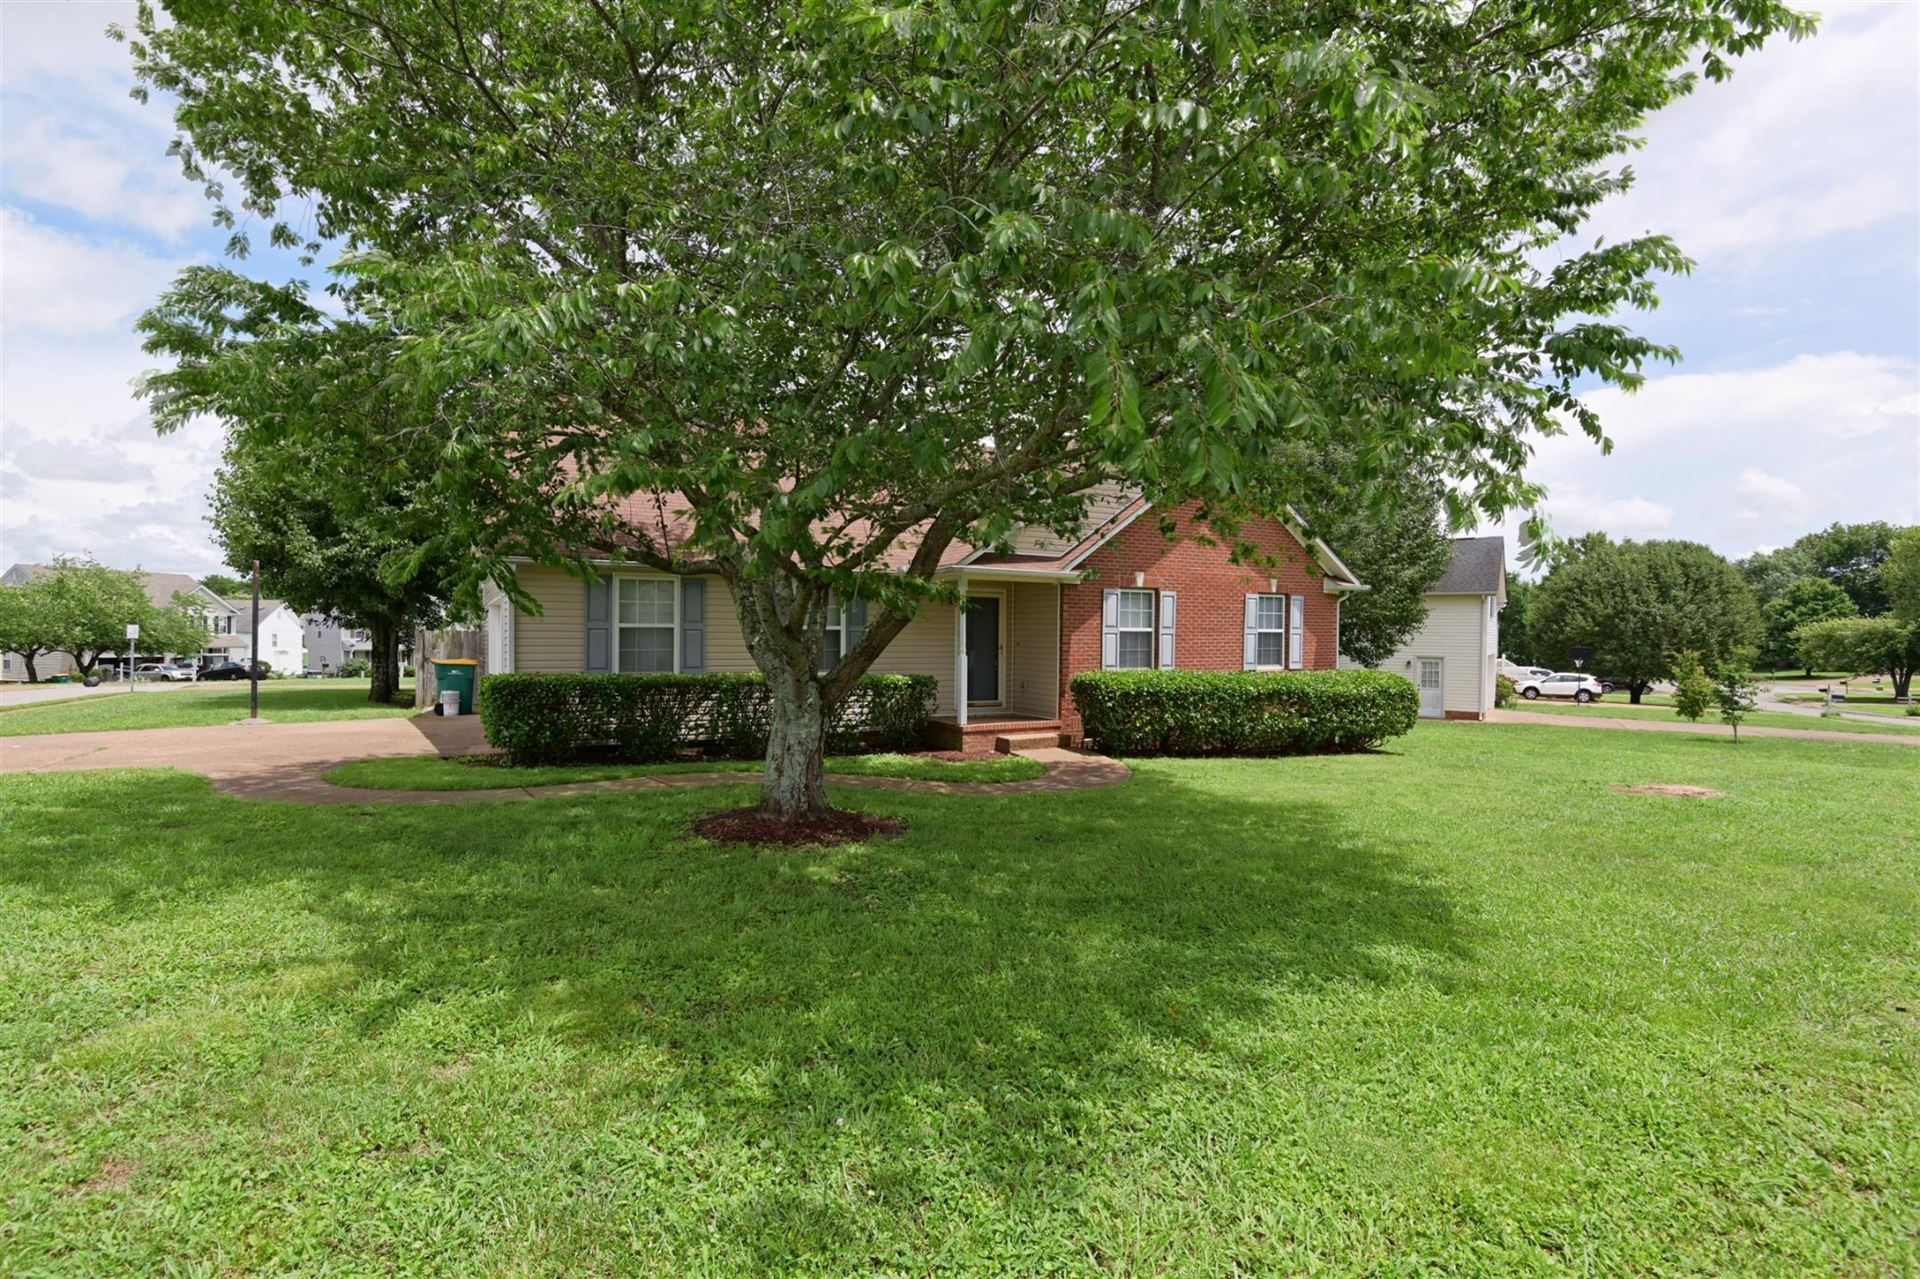 Photo of 2033 Prescott Way, Spring Hill, TN 37174 (MLS # 2275718)